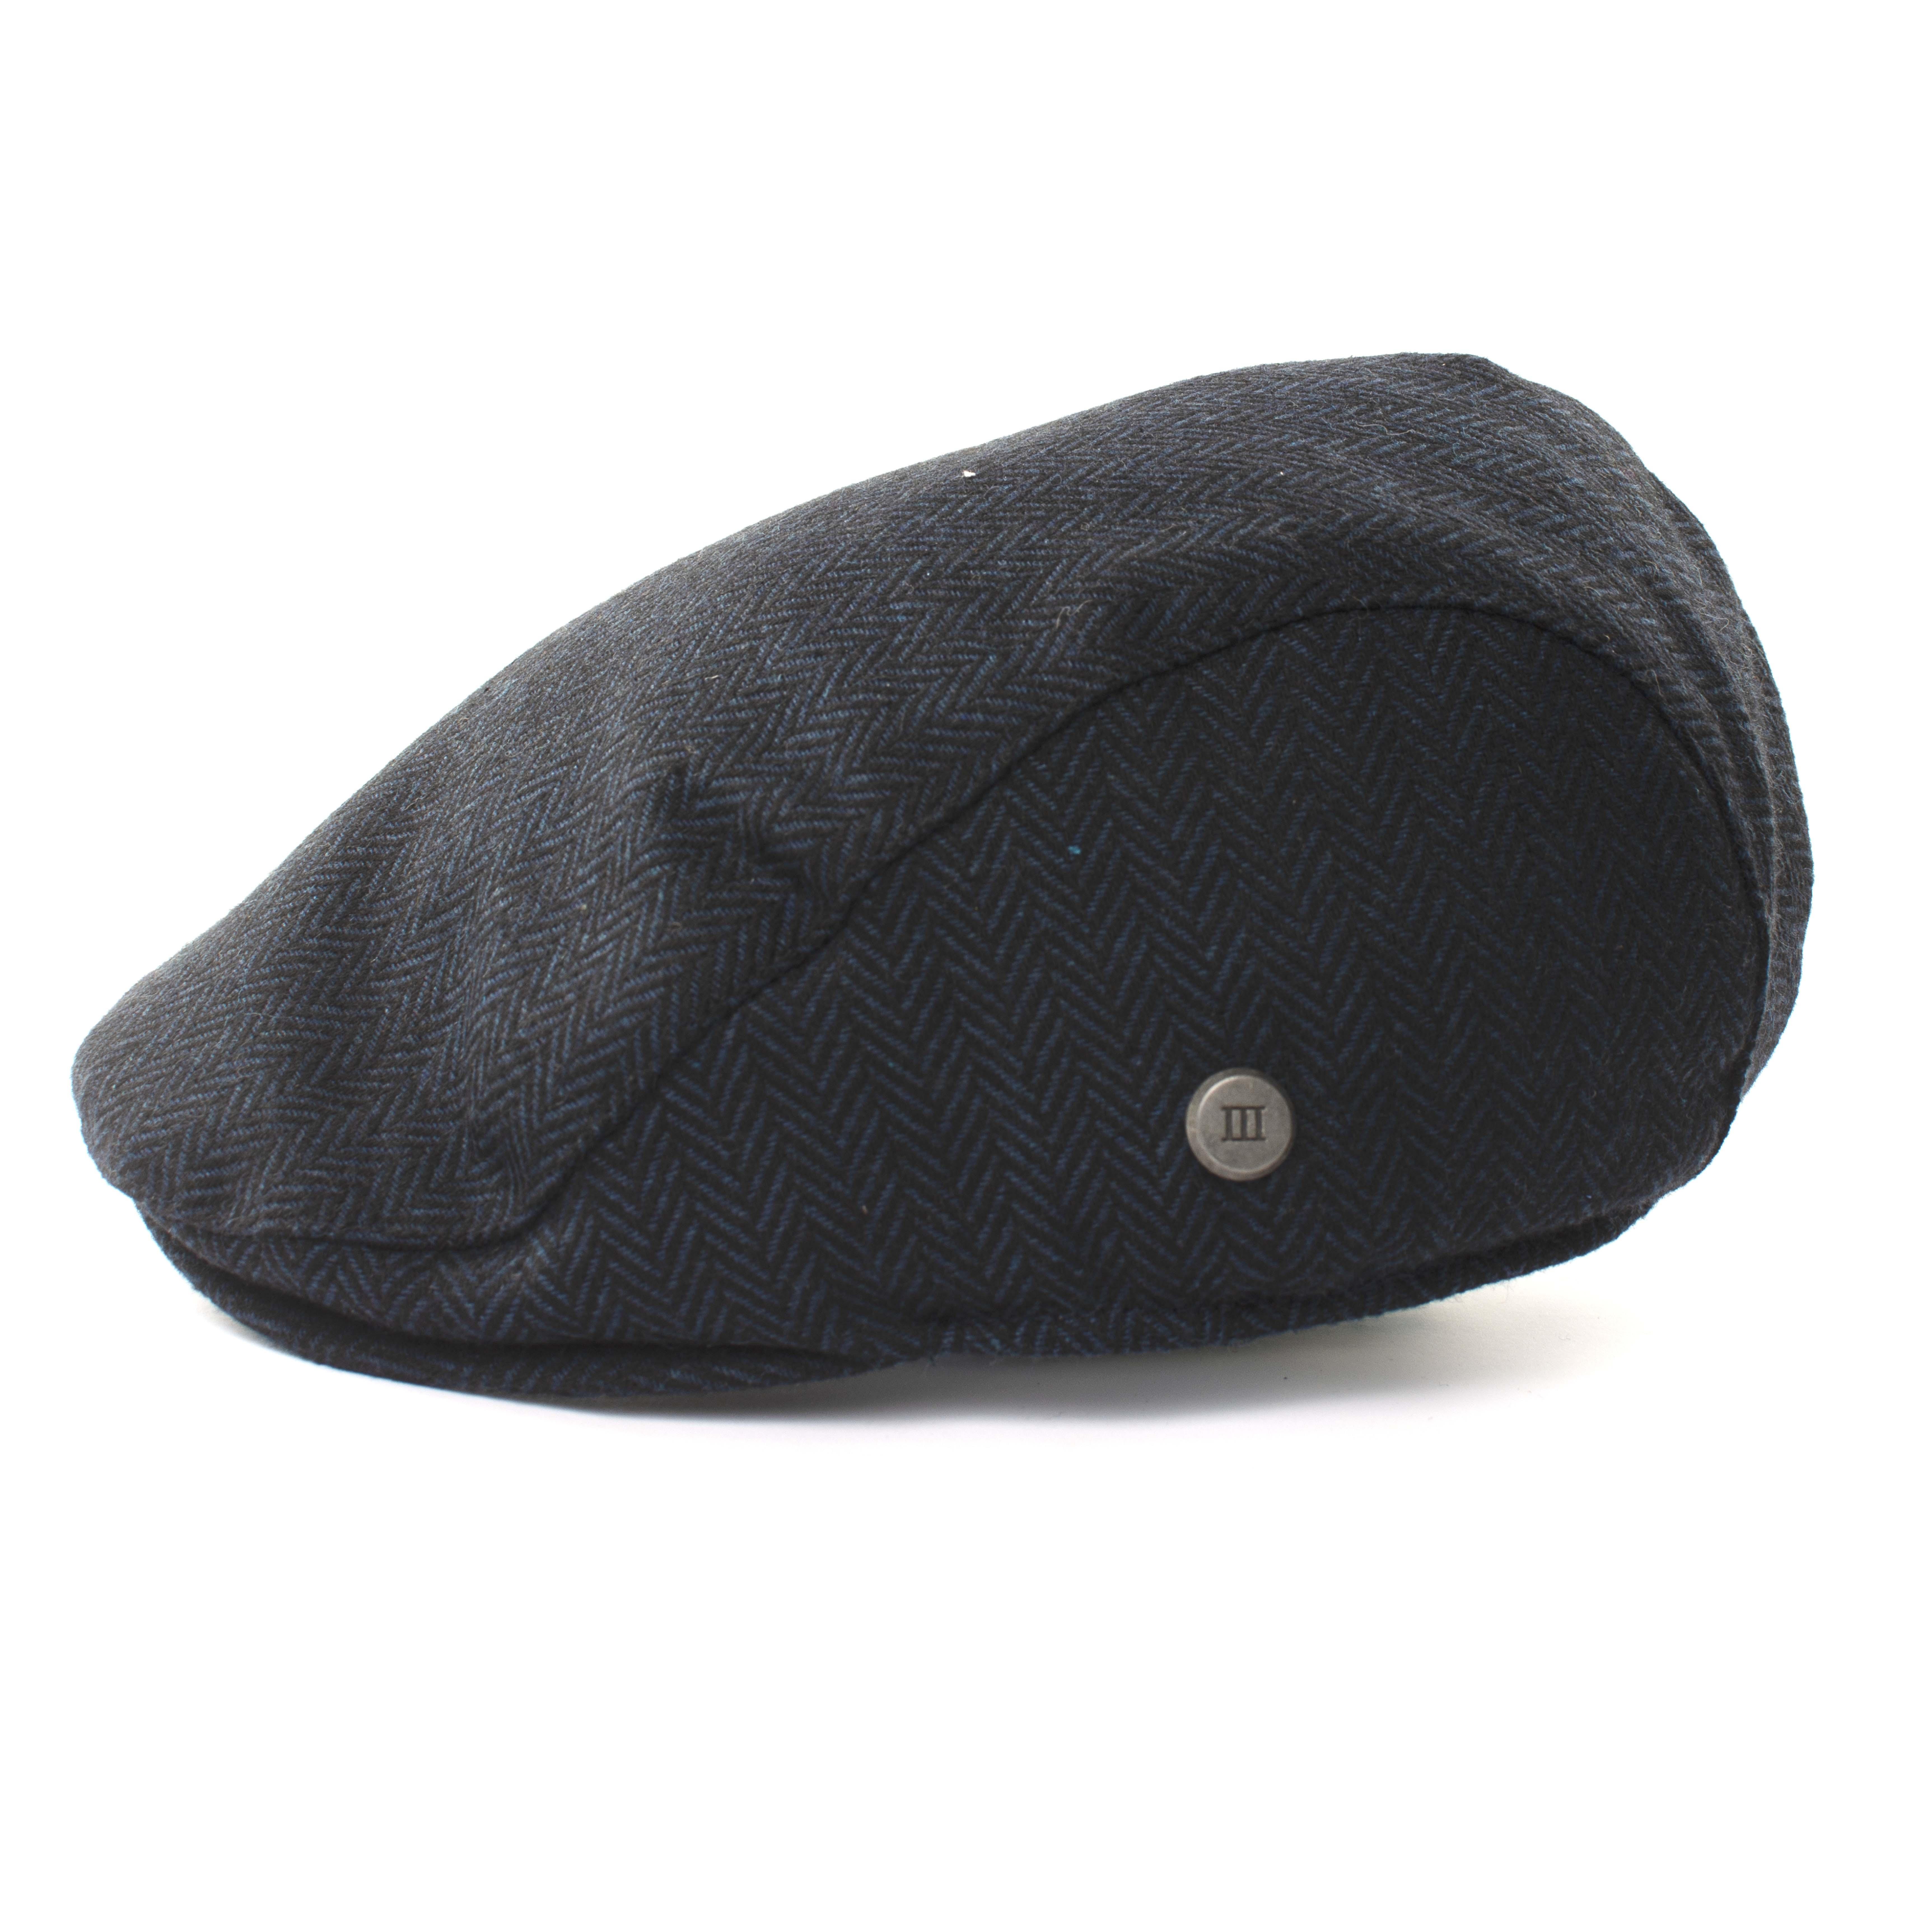 Navy herringbone flatcap